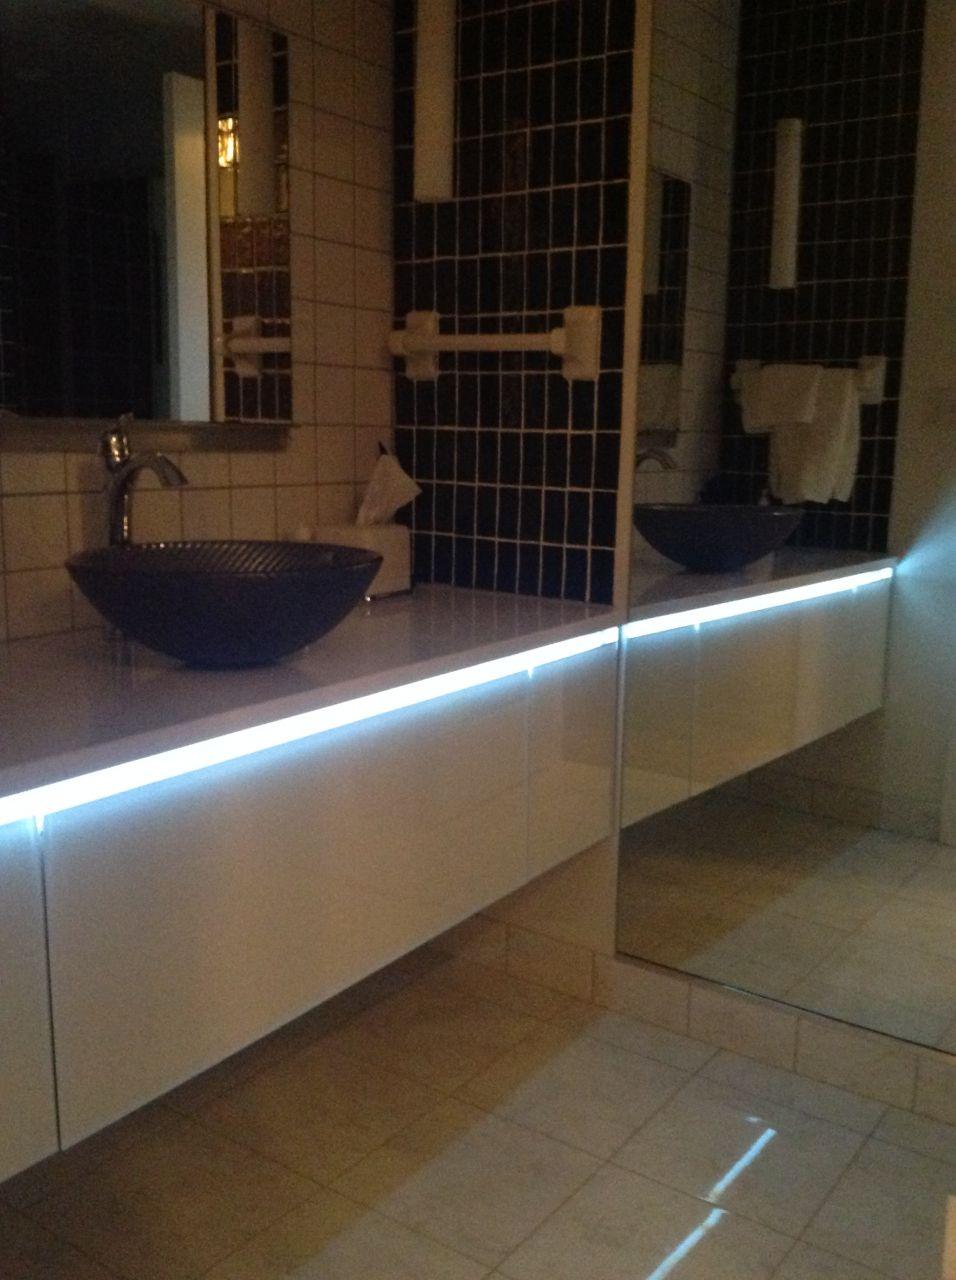 Robern bathroom vanities - Robern Wall Mounted Glass Door Cabinets With Led Lighting